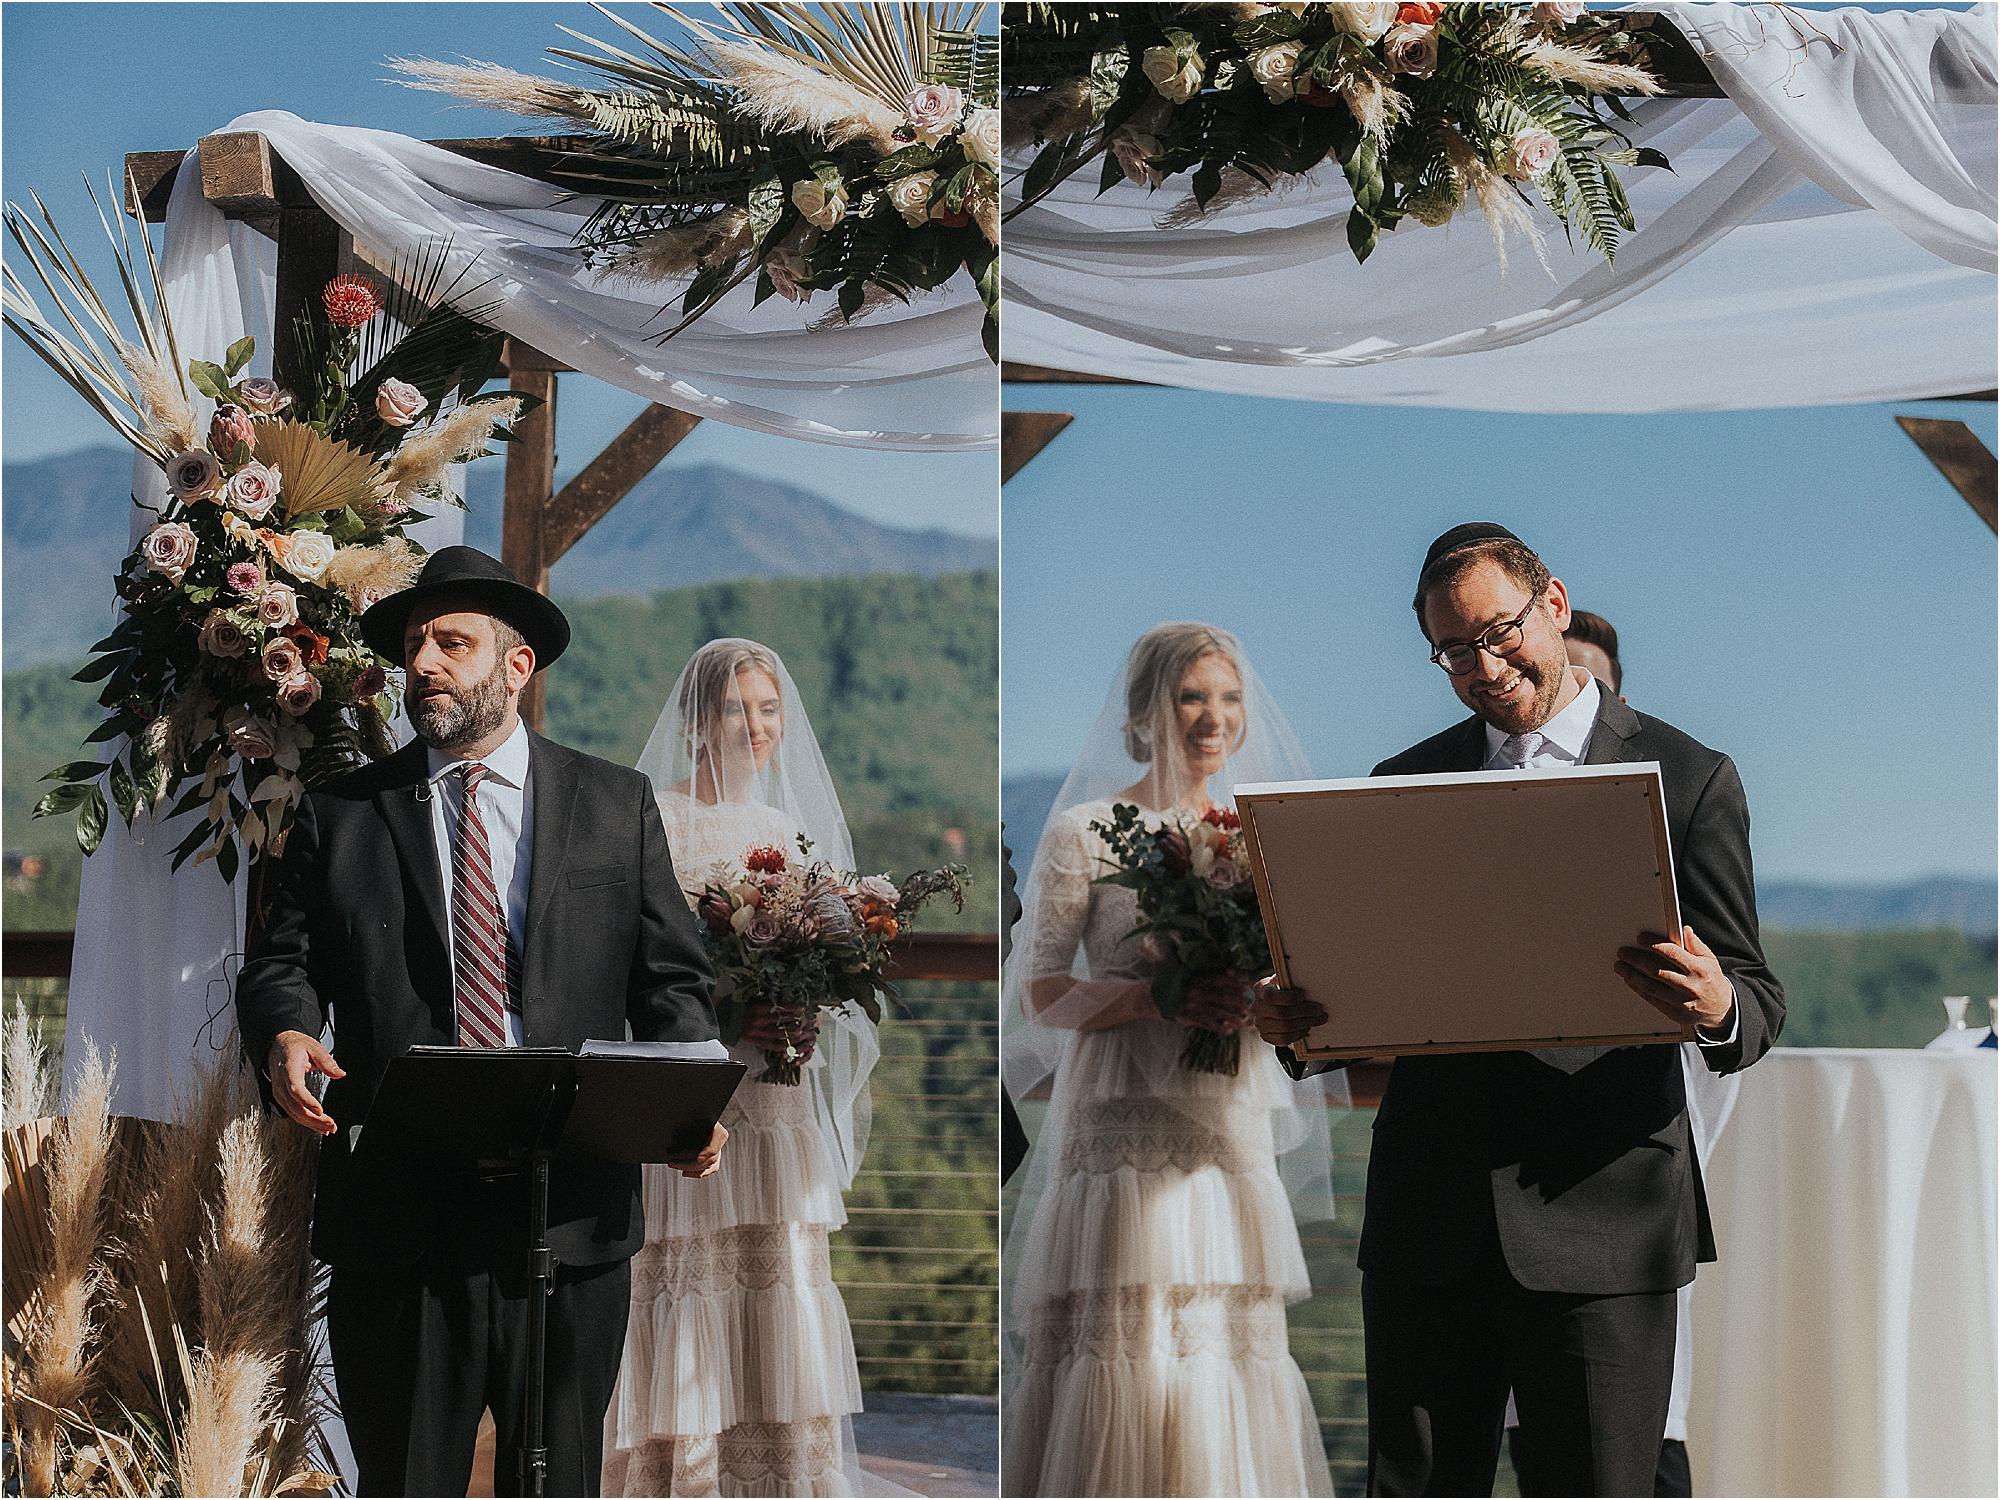 Joyful Jewish Wedding Ceremony